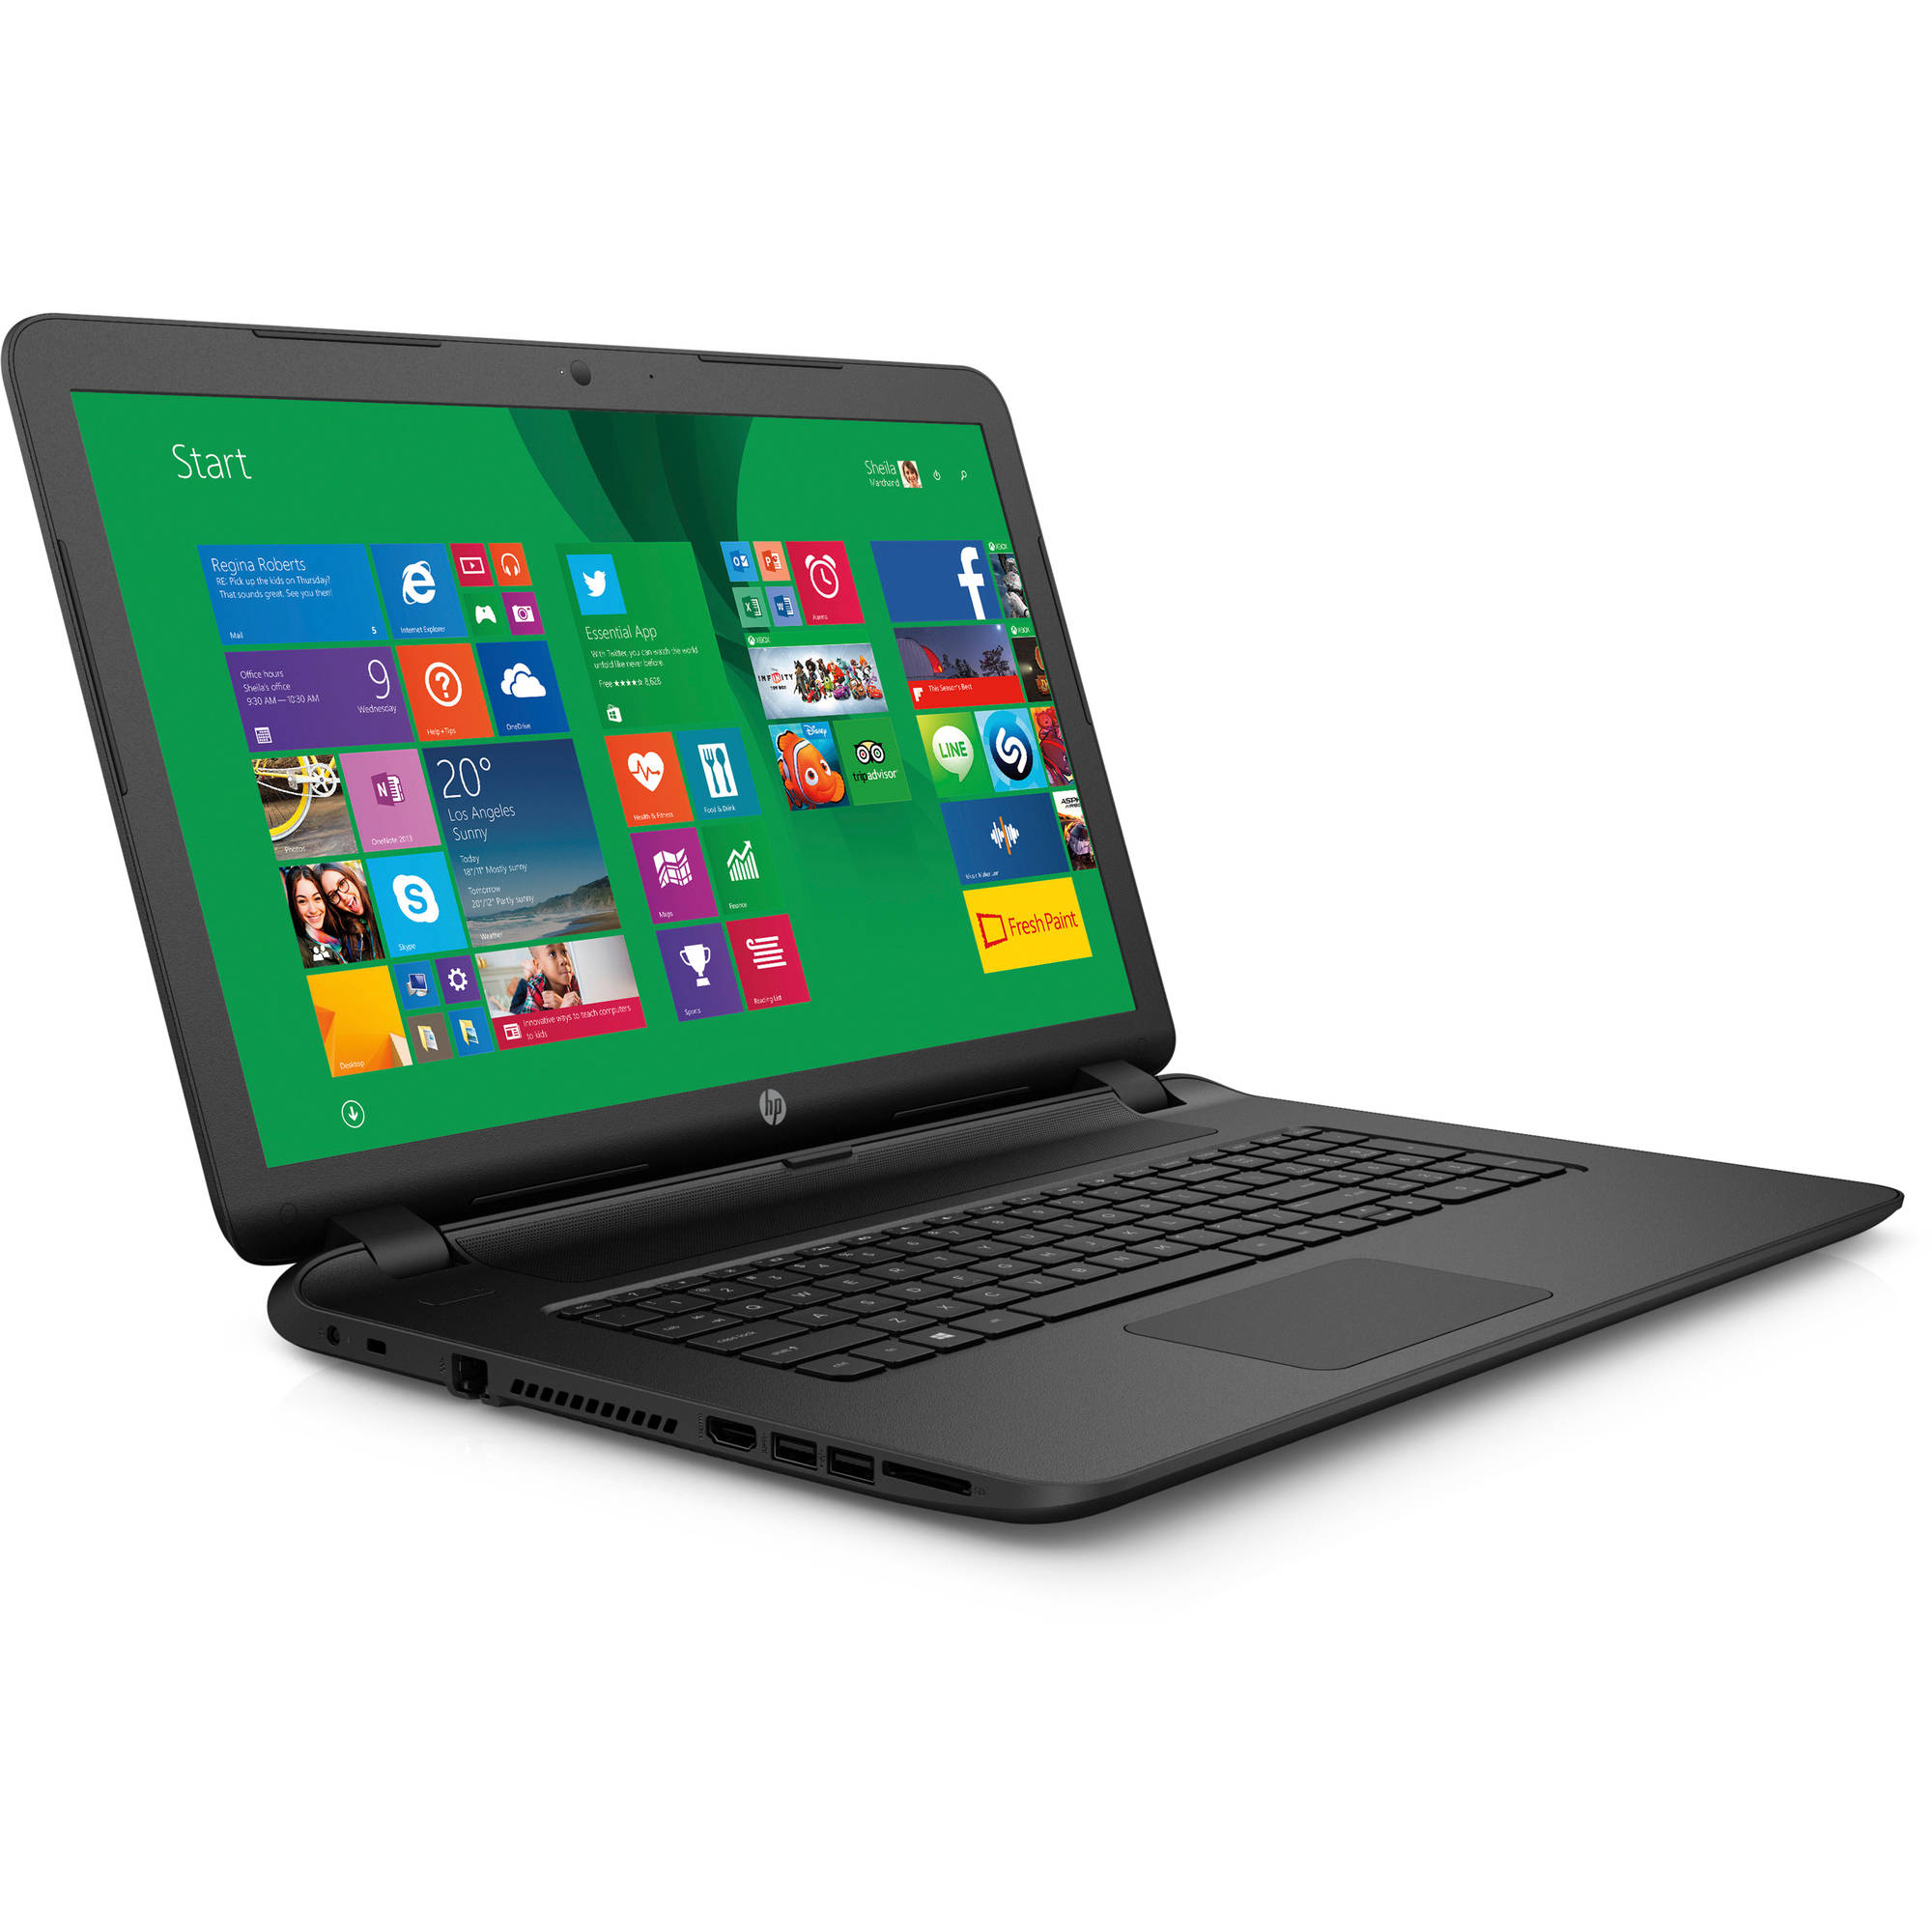 Hp notebook laptop windows 8 - Hp Black 15 6 15 F133wm Laptop Pc With Intel Celeron N2840 Processor 4gb Memory 500gb Hard Drive And Windows 8 1 Free Windows 10 Upgrade Before July 29